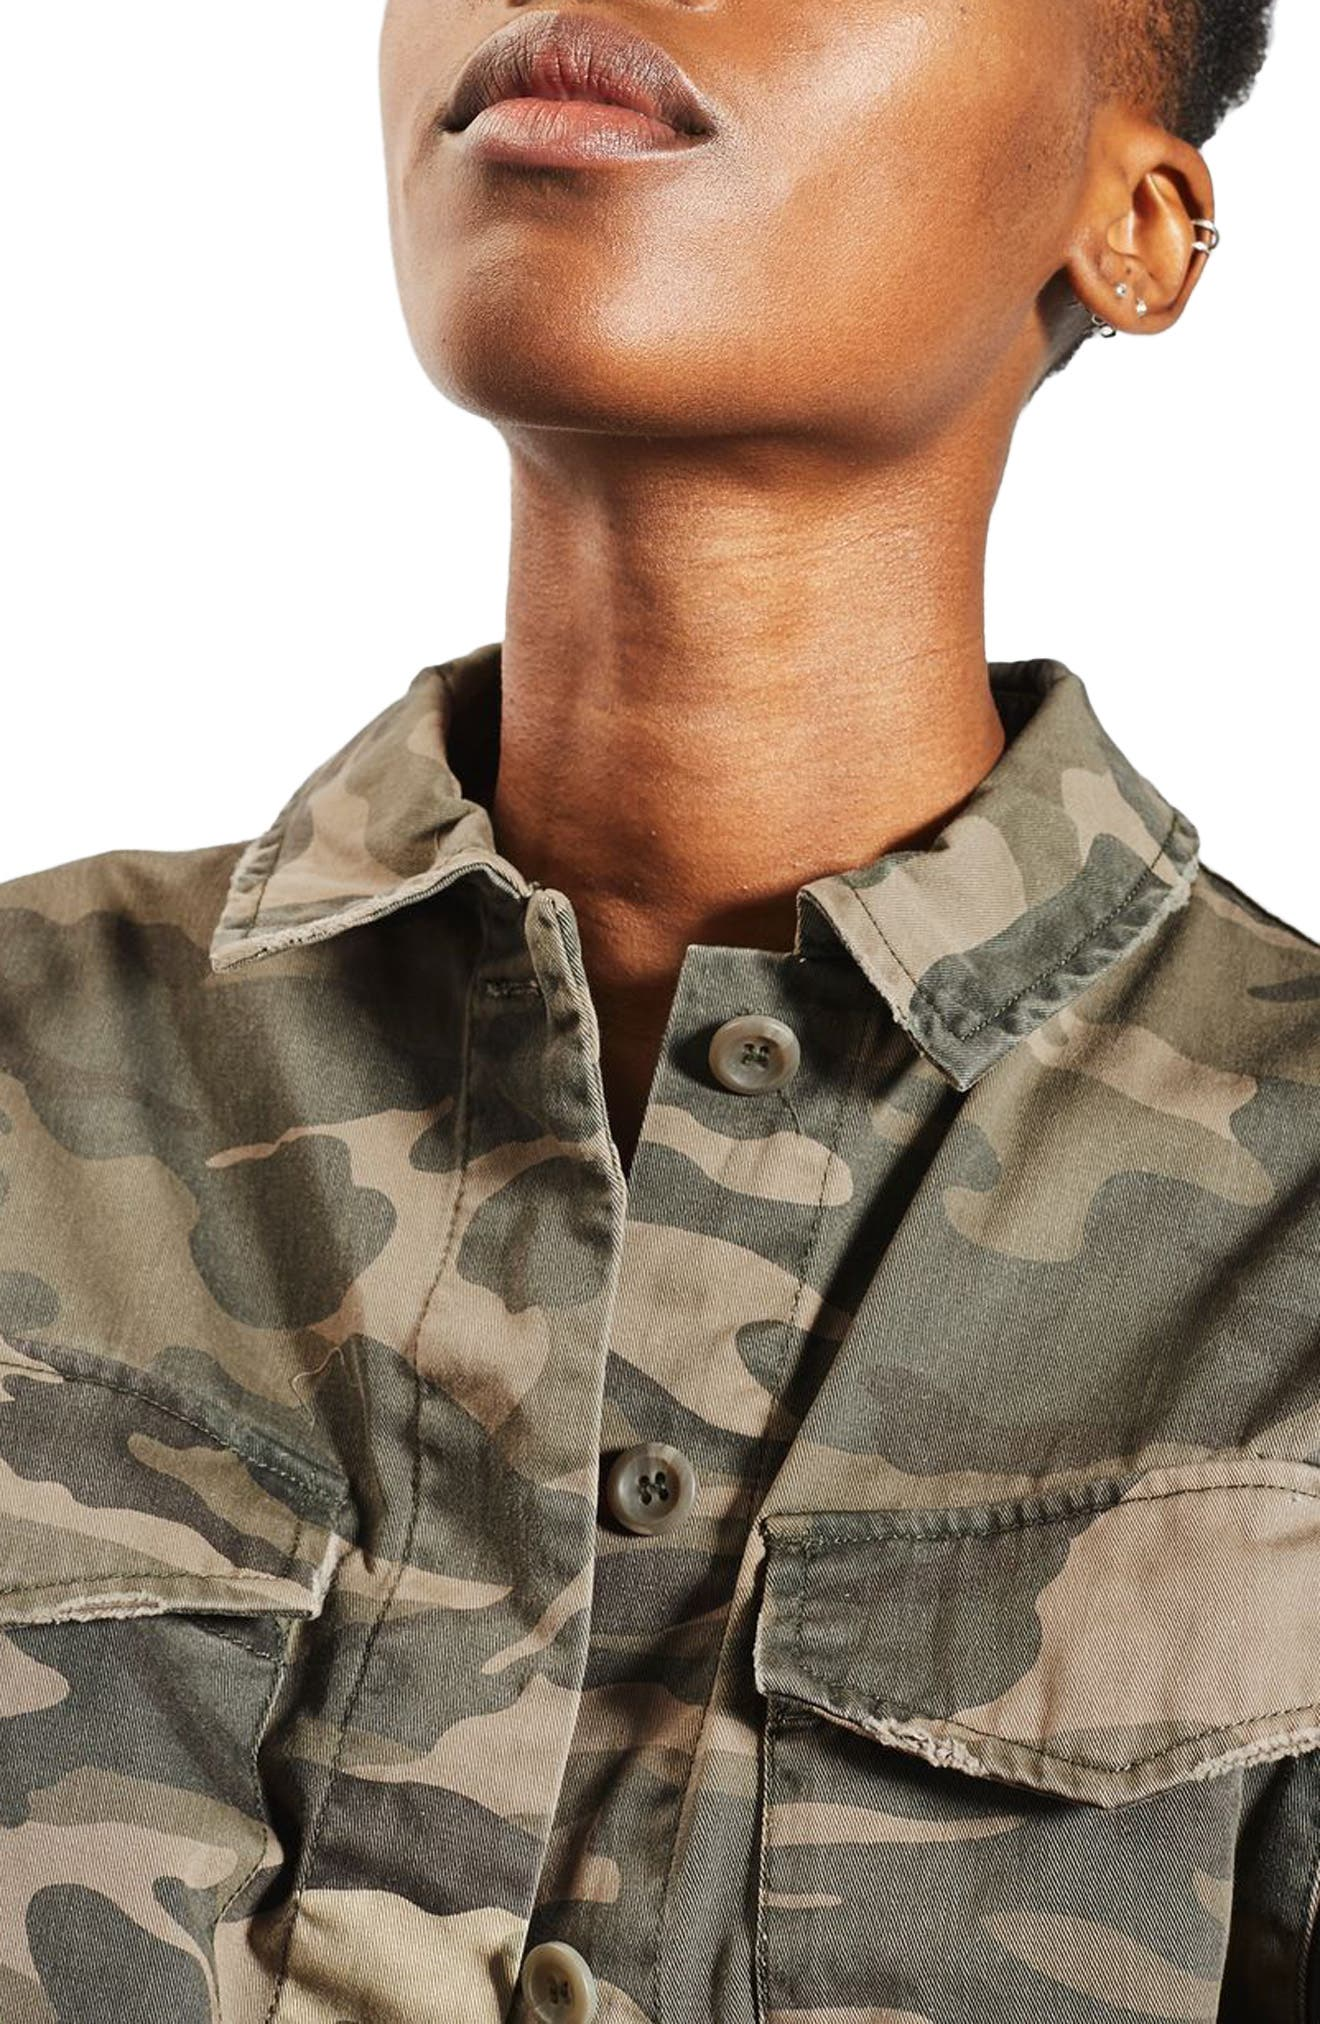 TOPSHOP, Sampson Camo Shirt Jacket, Alternate thumbnail 3, color, 300